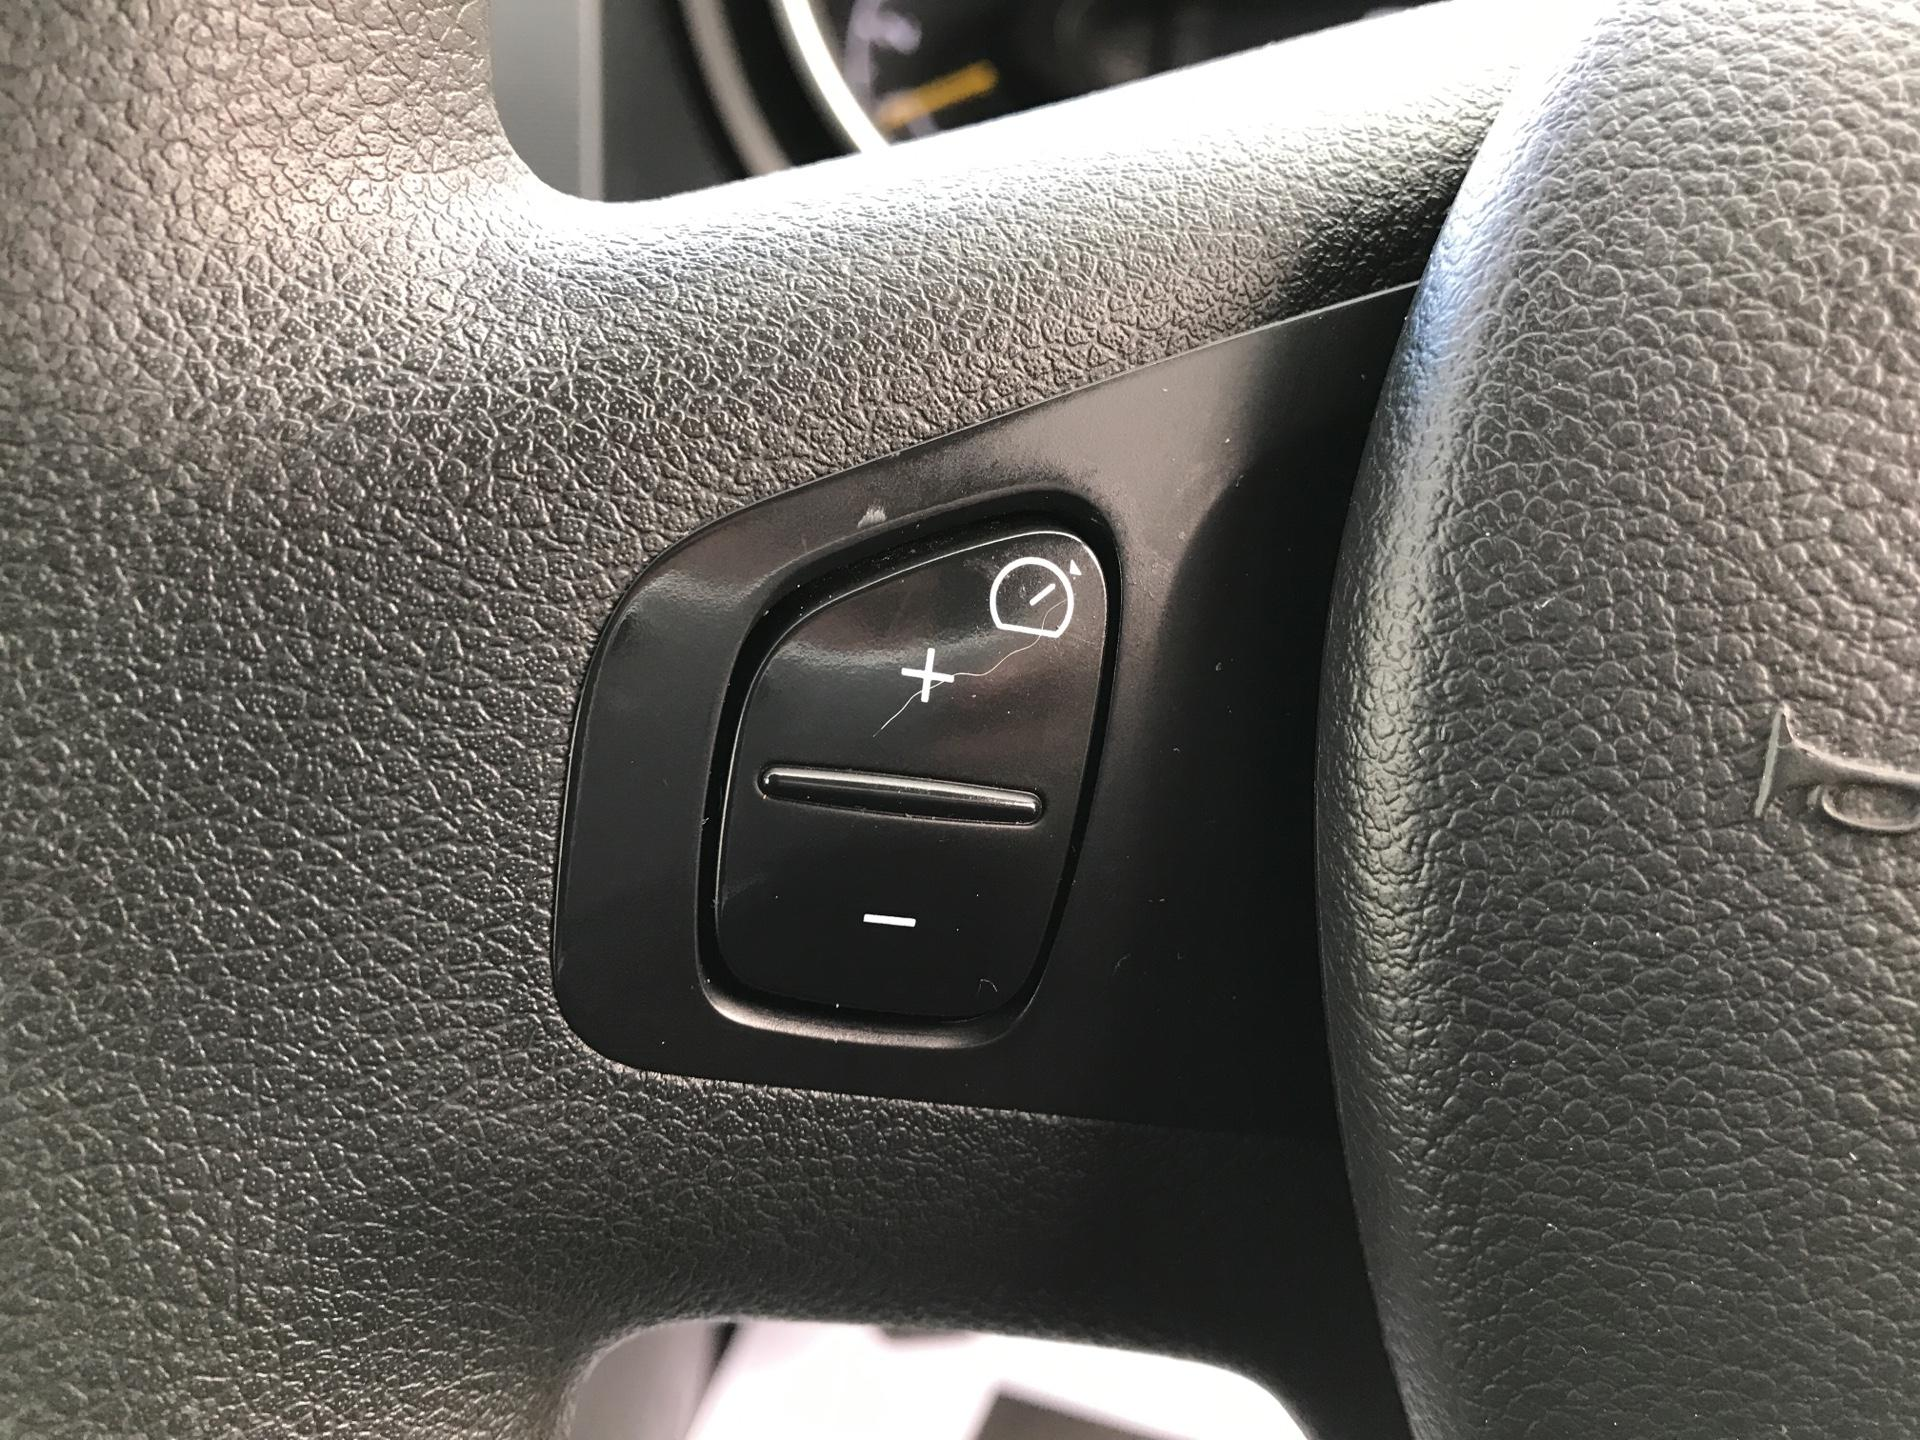 2015 Vauxhall Vivaro L1 H1 2700 1.6 BITURBO 120PS ECOFLEX SPORTIVE EURO 5 (DP15LGO) Image 24